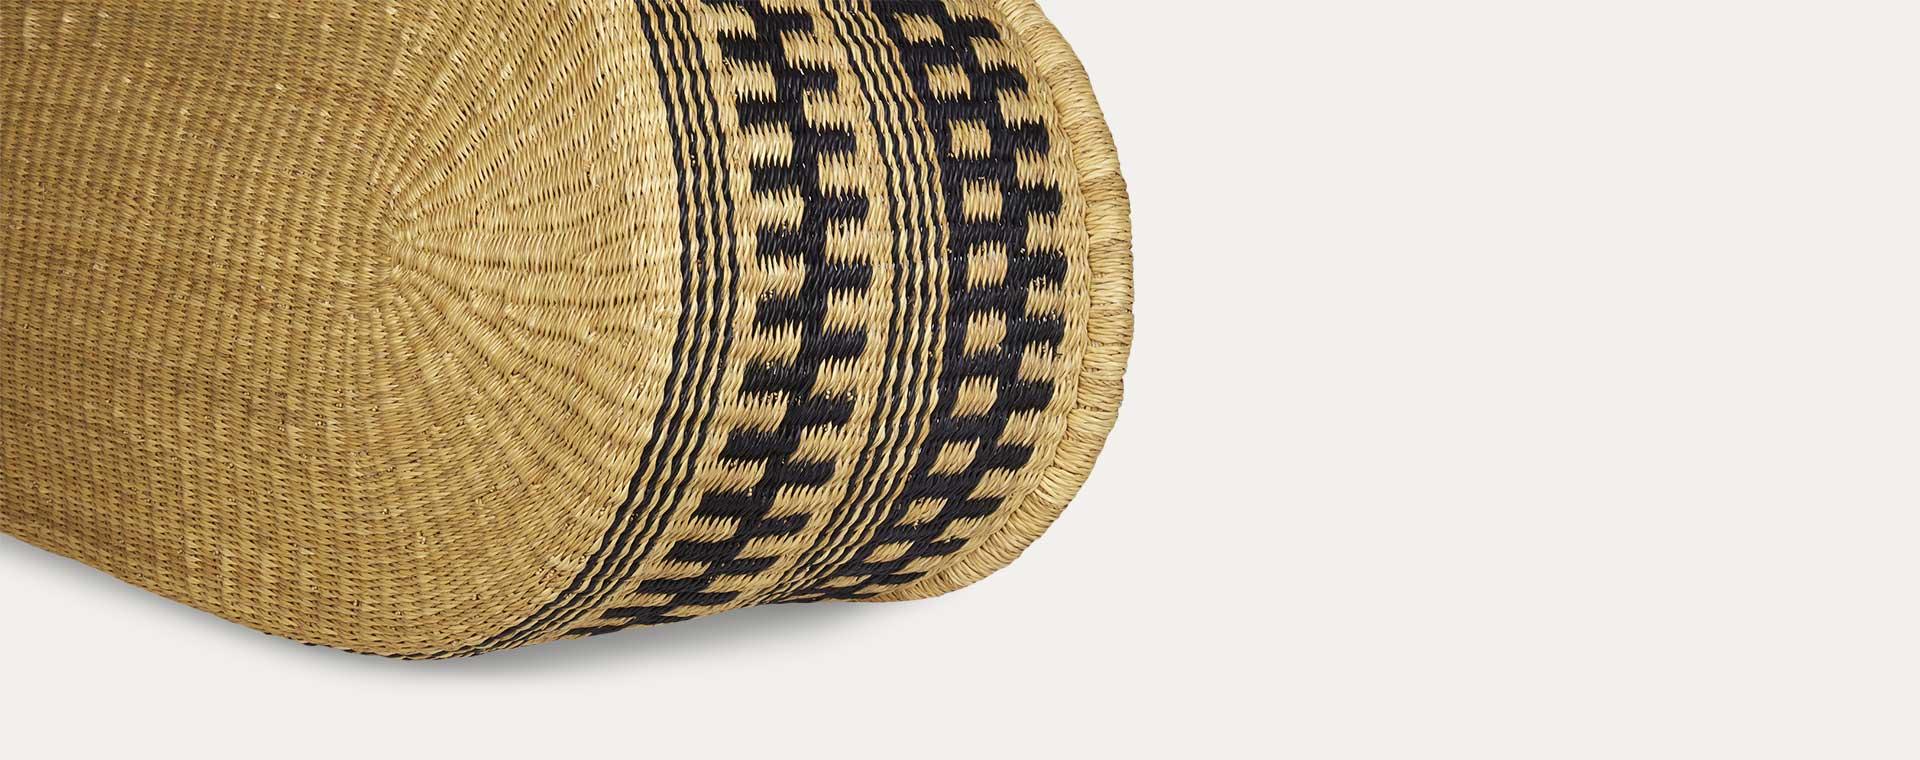 Huntuma The Basket Room Moses Basket